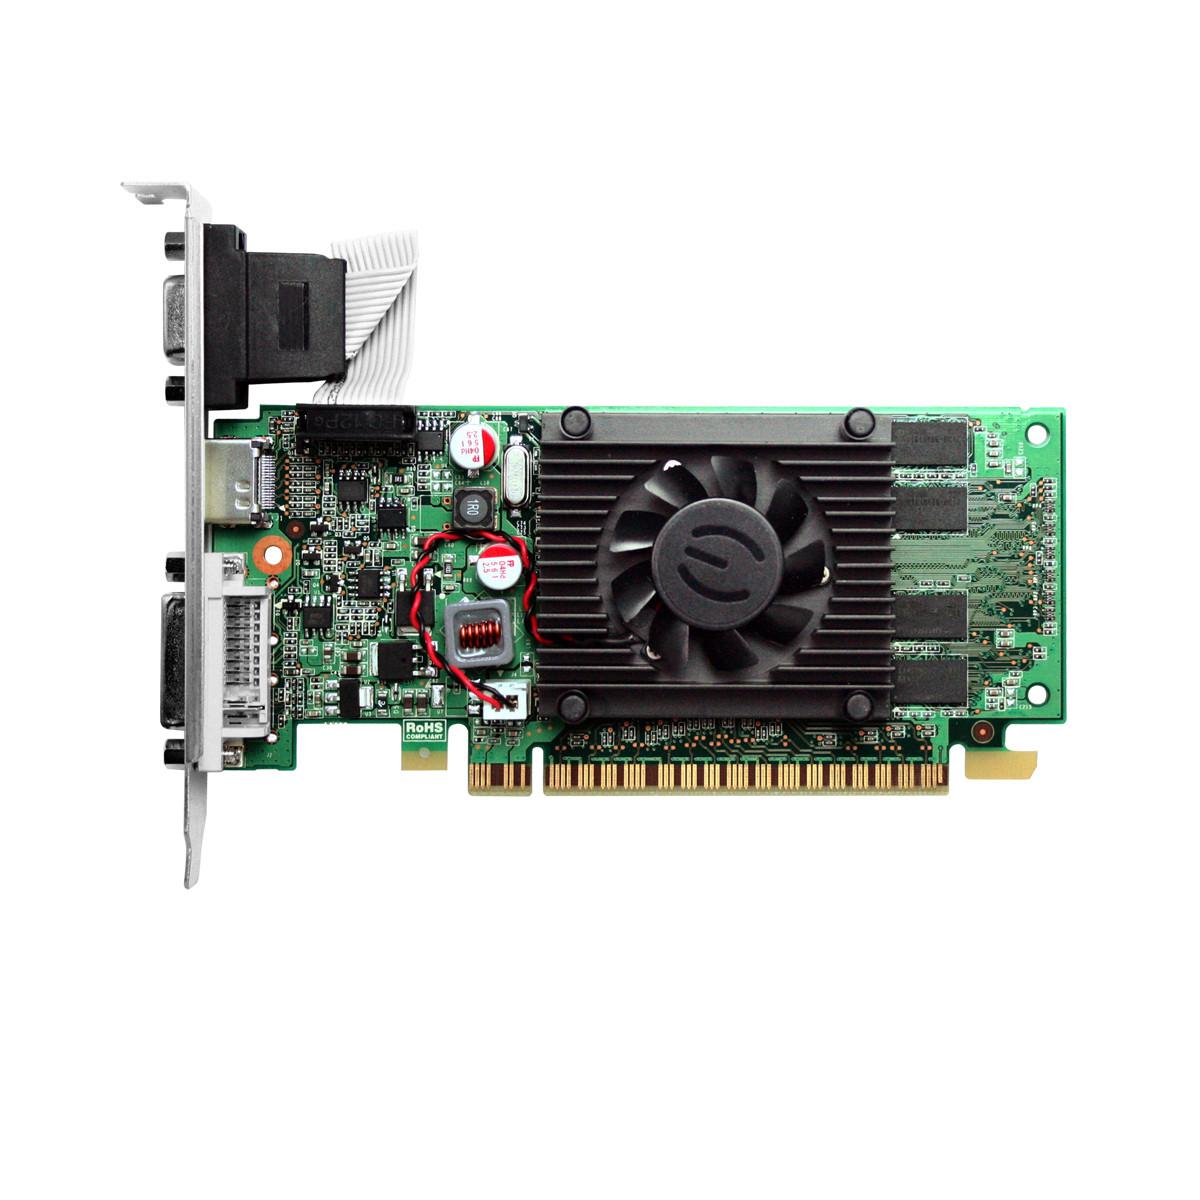 GeForce 8400 GS 512MB GDDR3 (64bit) (520/1040) (VGA, DVI, HDMI) (ZT-84GEM2M-HSL)